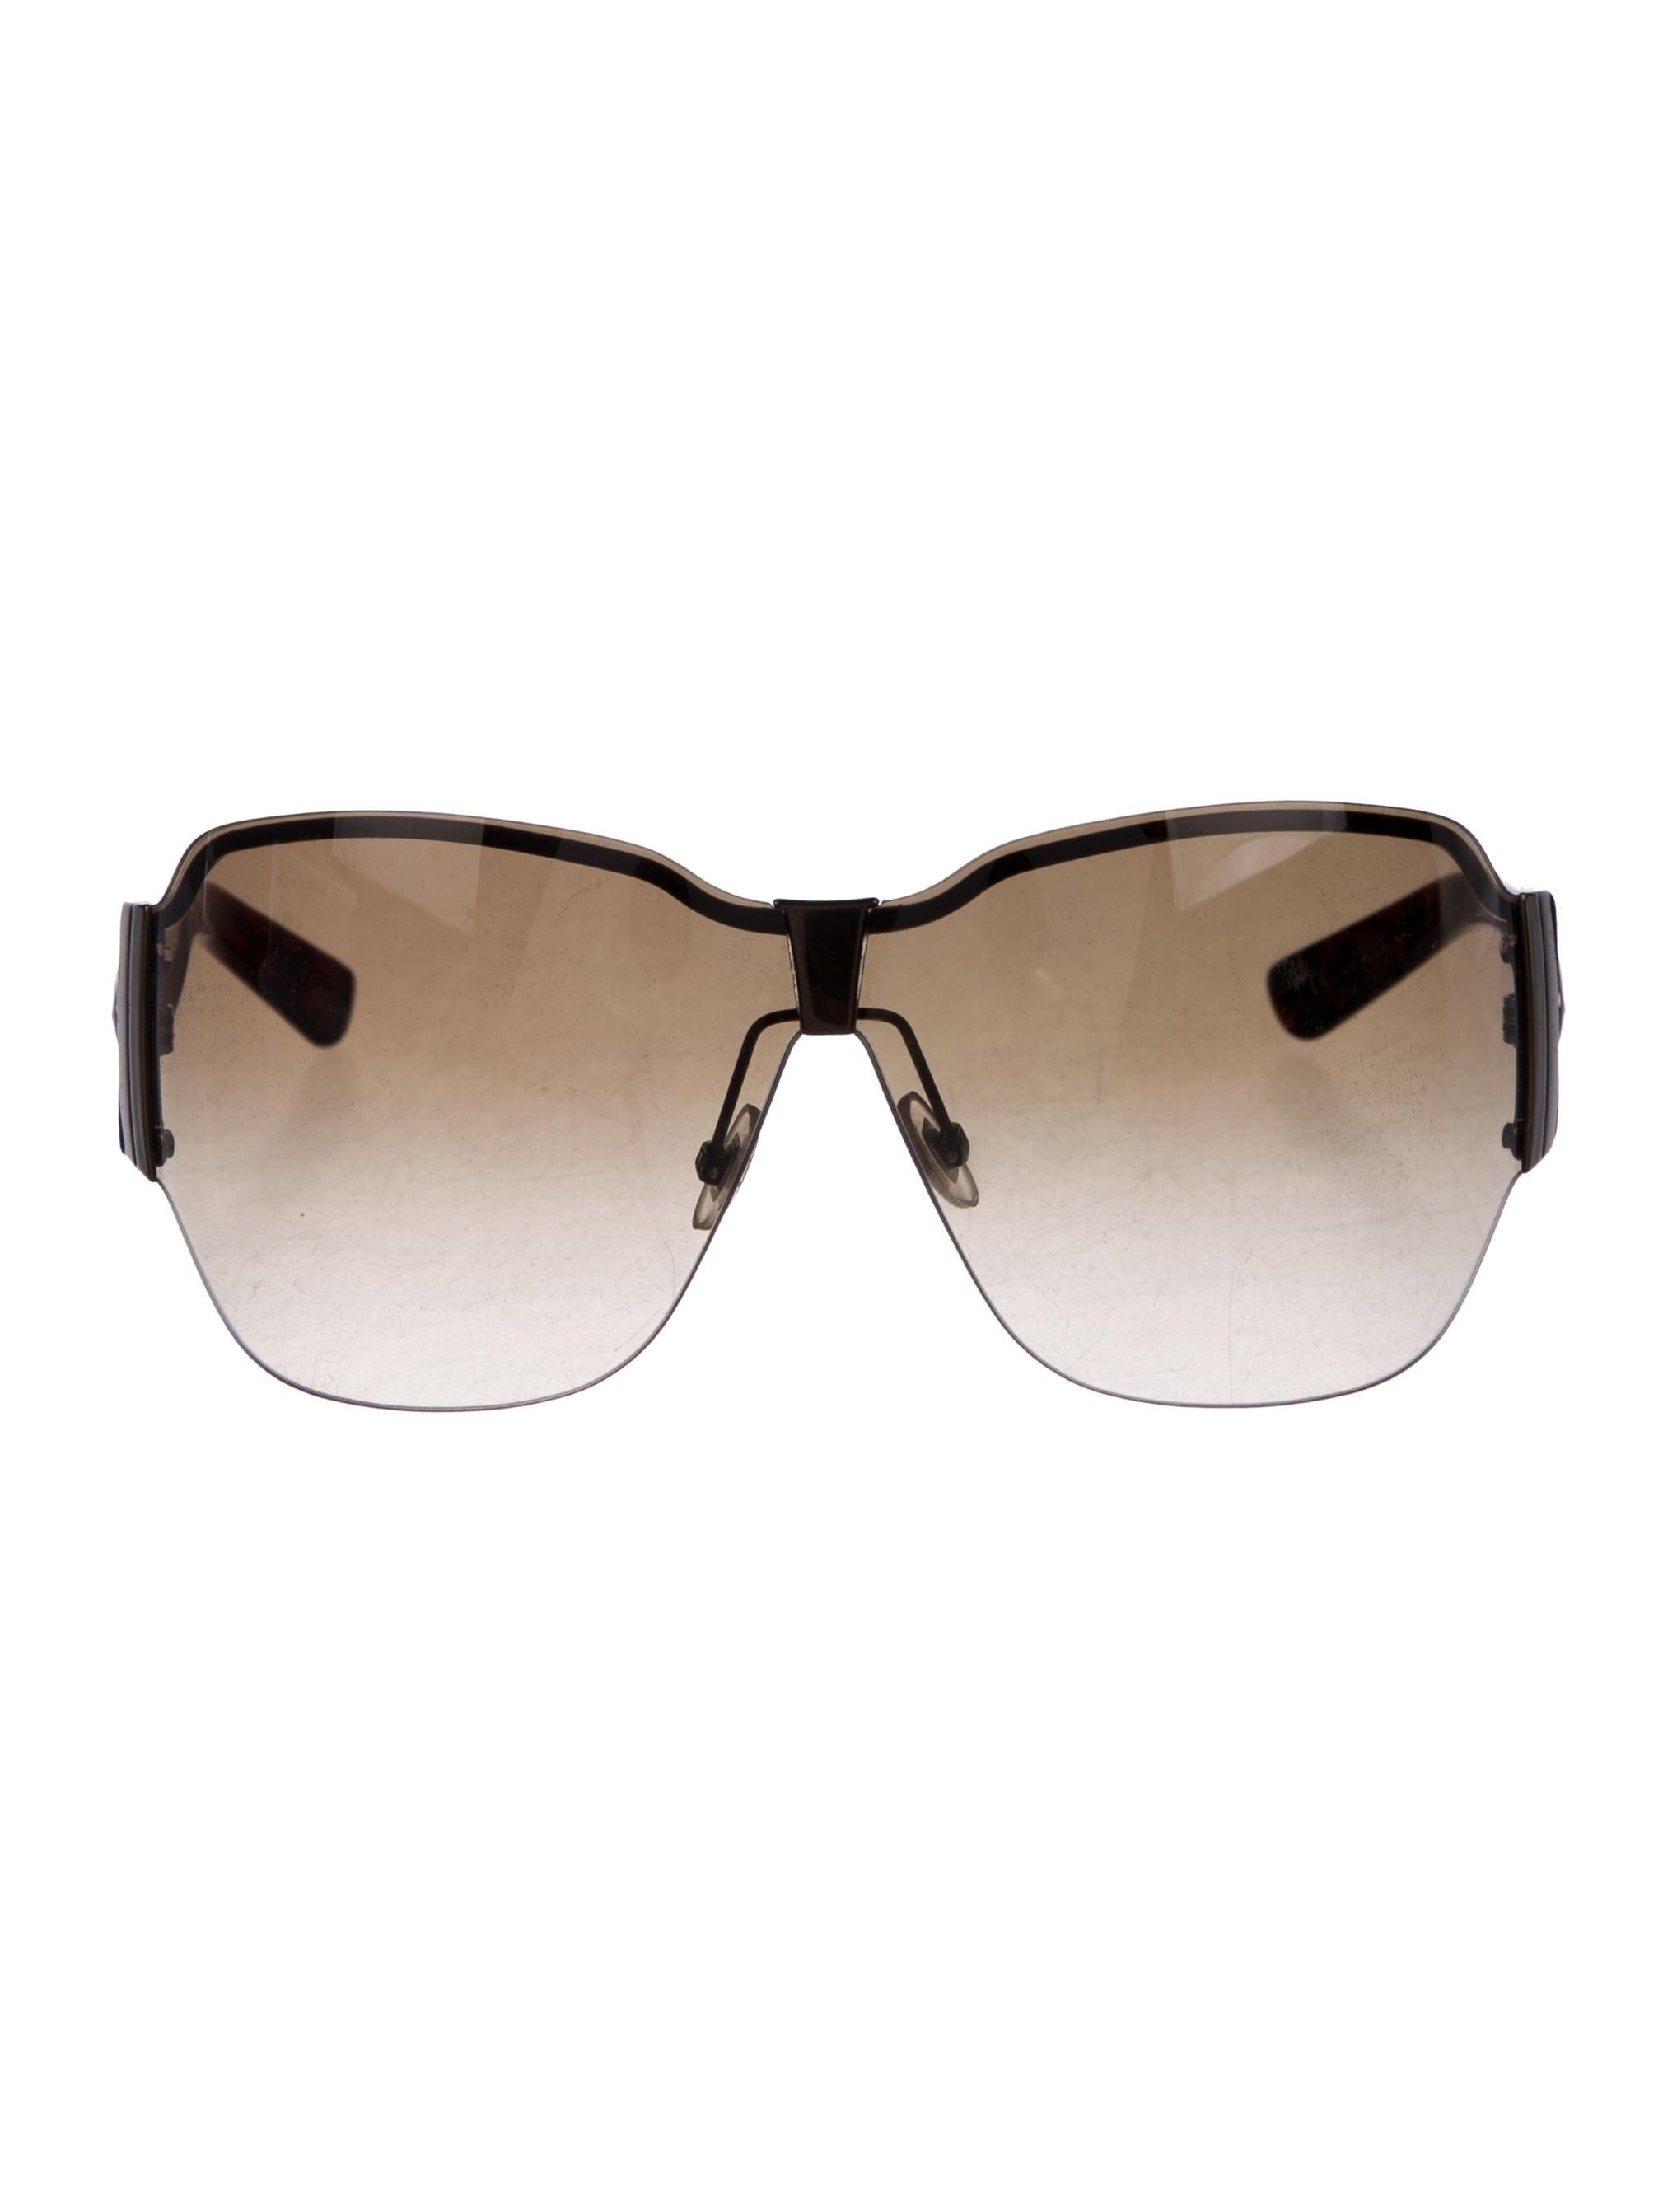 9dbb95cc14626 Women · Accessories  Gucci Tinted Oversize Sunglasses. Tinted Oversize  Sunglasses